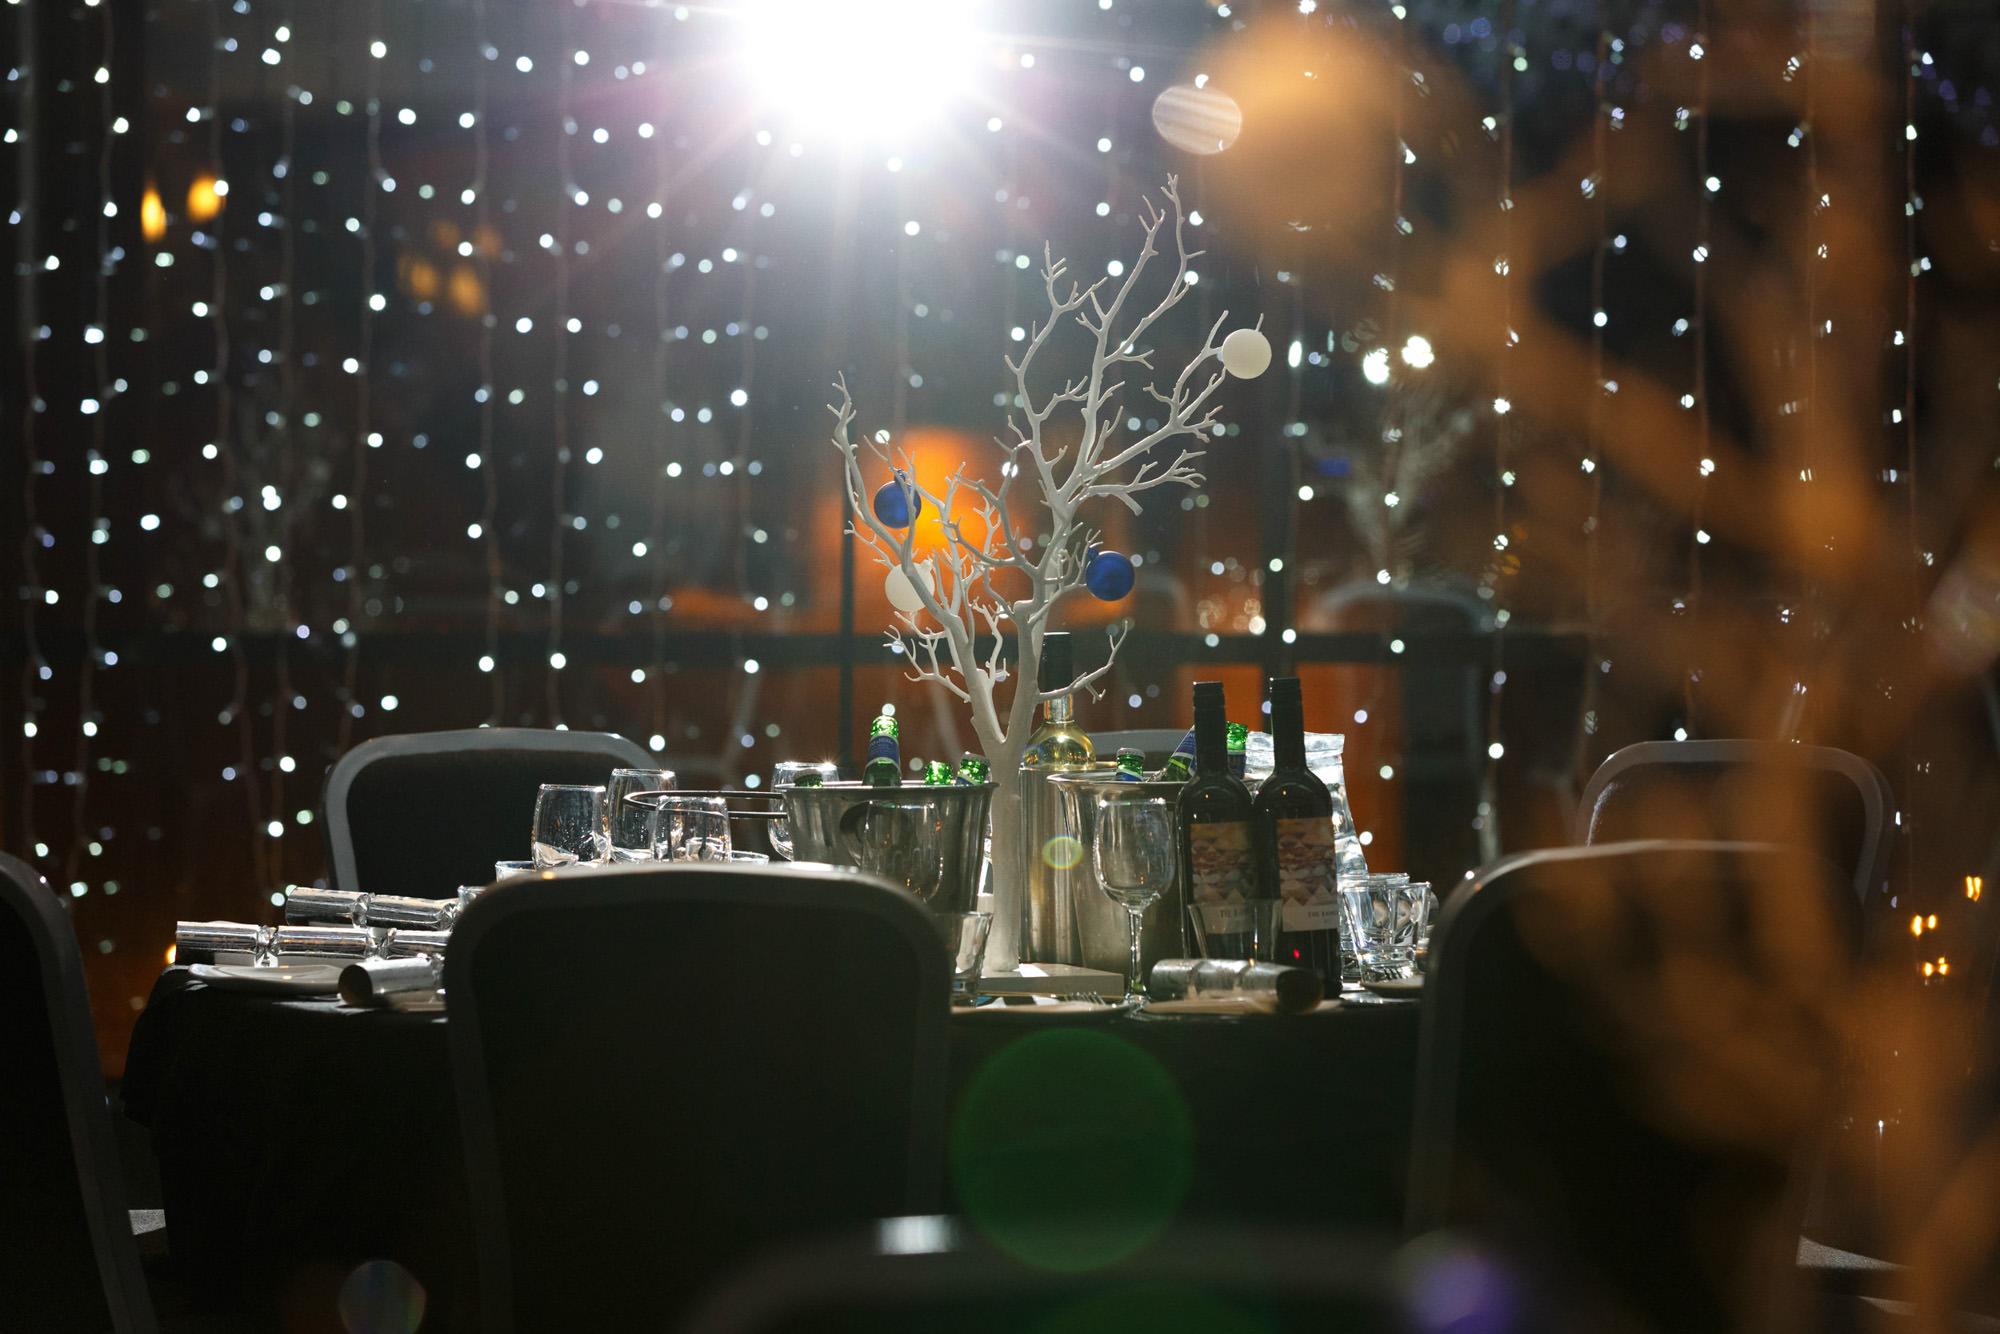 ChristmasParty-Boulting-15Dec18-TangerineEventPhotography-4.jpg